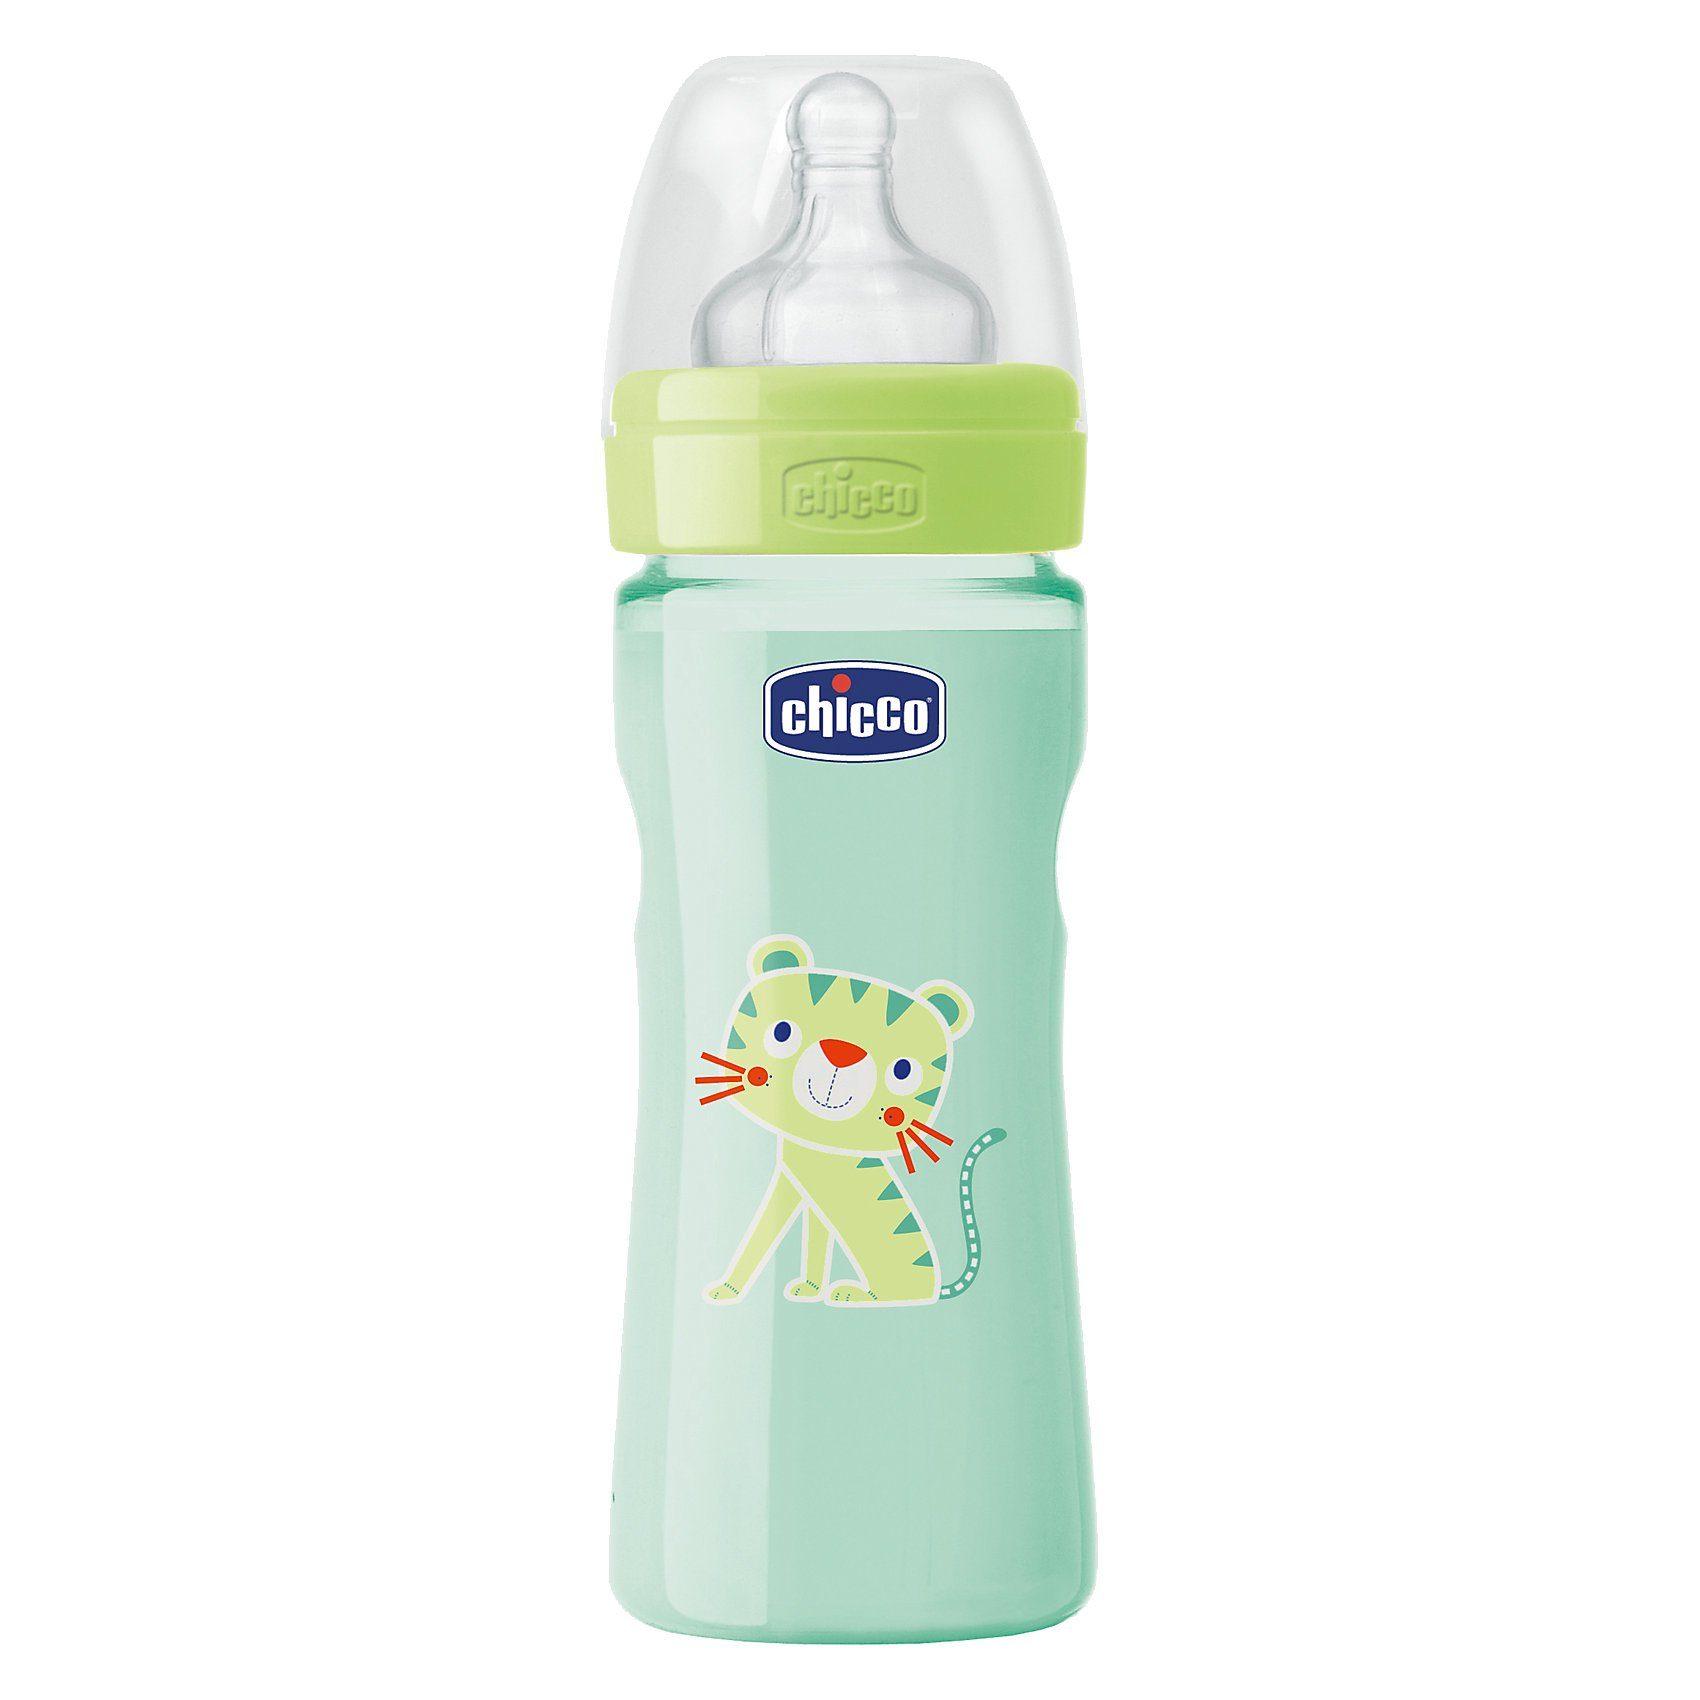 CHICCO Weithals Flasche Wohlbefinden, Coloured, PP, 250 ml, Silikon